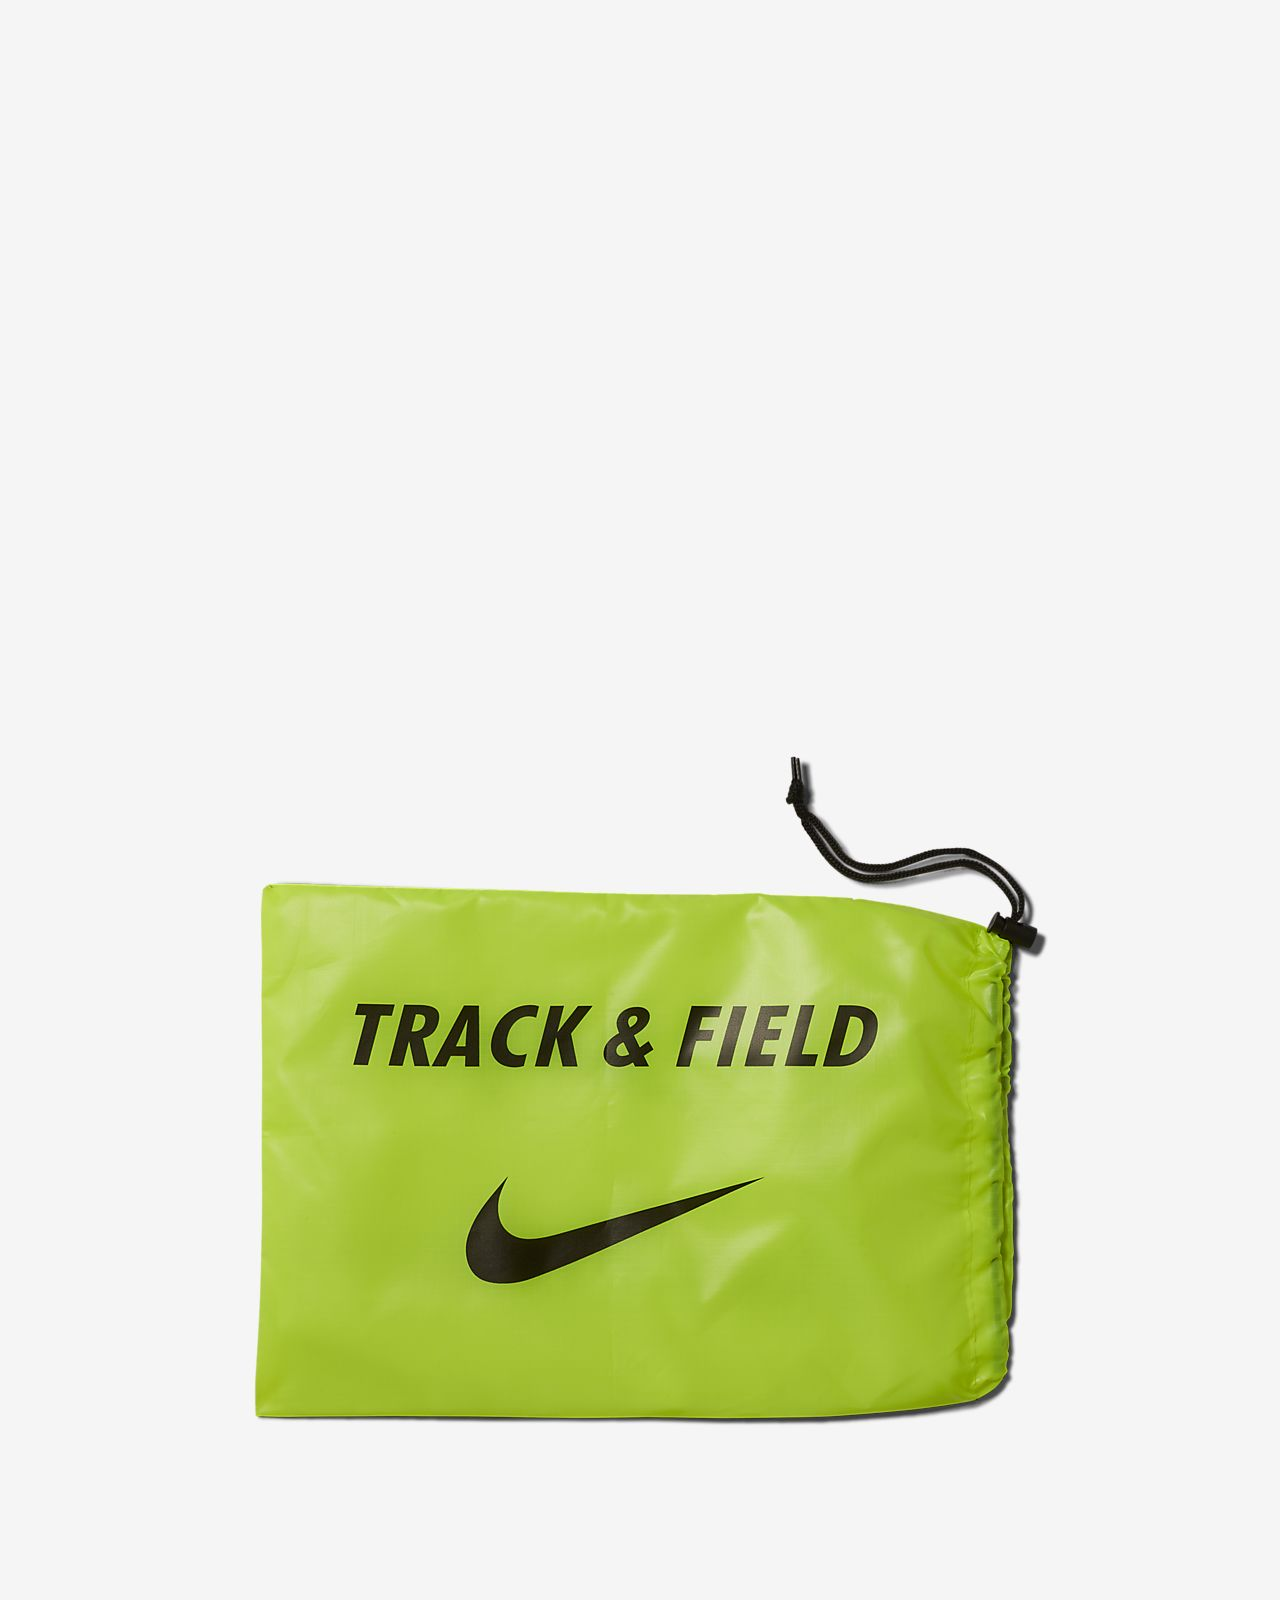 wholesale dealer 0a6ba 7bd75 ... Nike Zoom Ja Fly 3 Unisex Track Spike